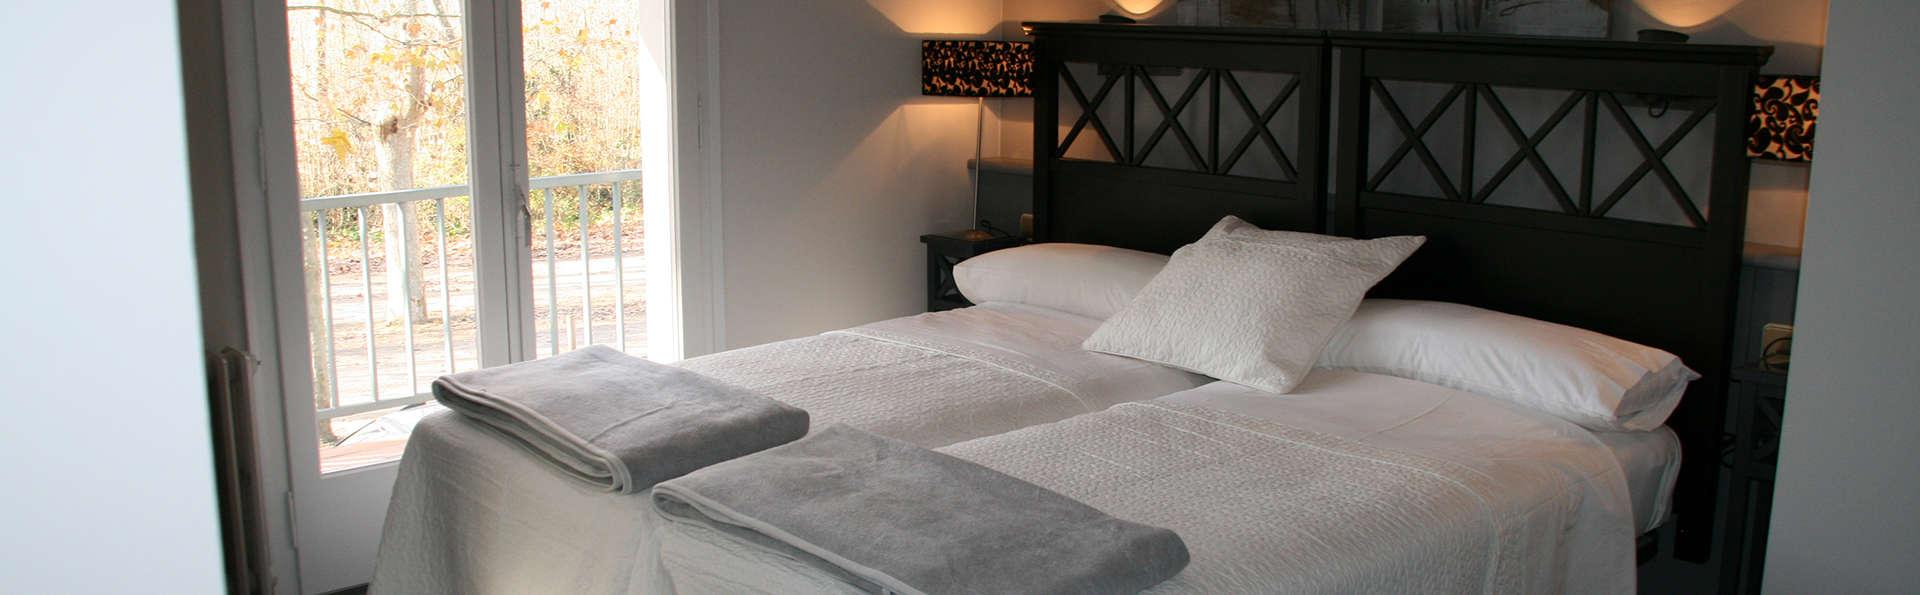 Hotel L'Ast - edit_room3213.jpg